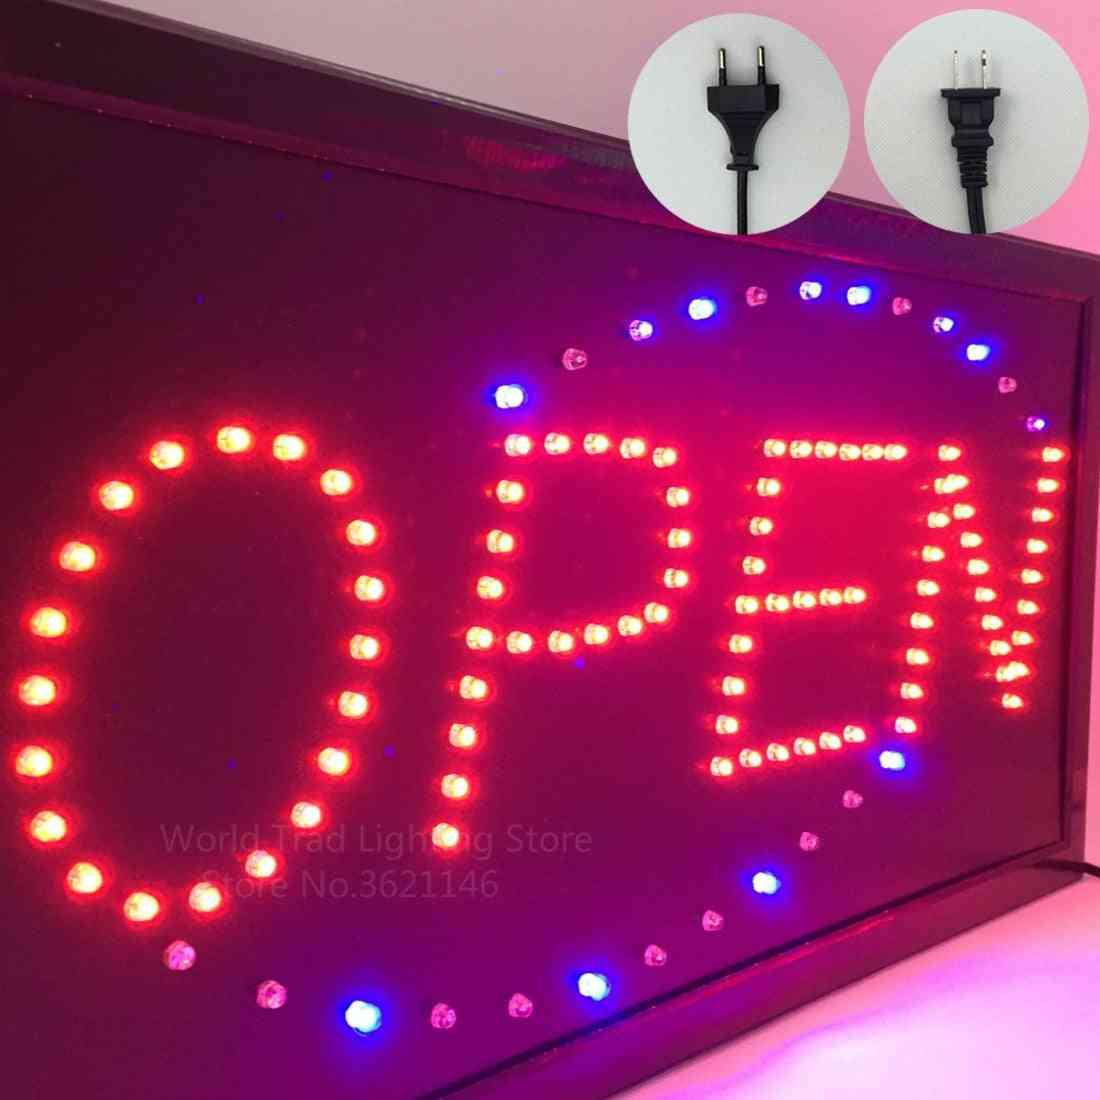 Led Store Open Sign Logo Advertising Light Board Shopping Mall Bright Light